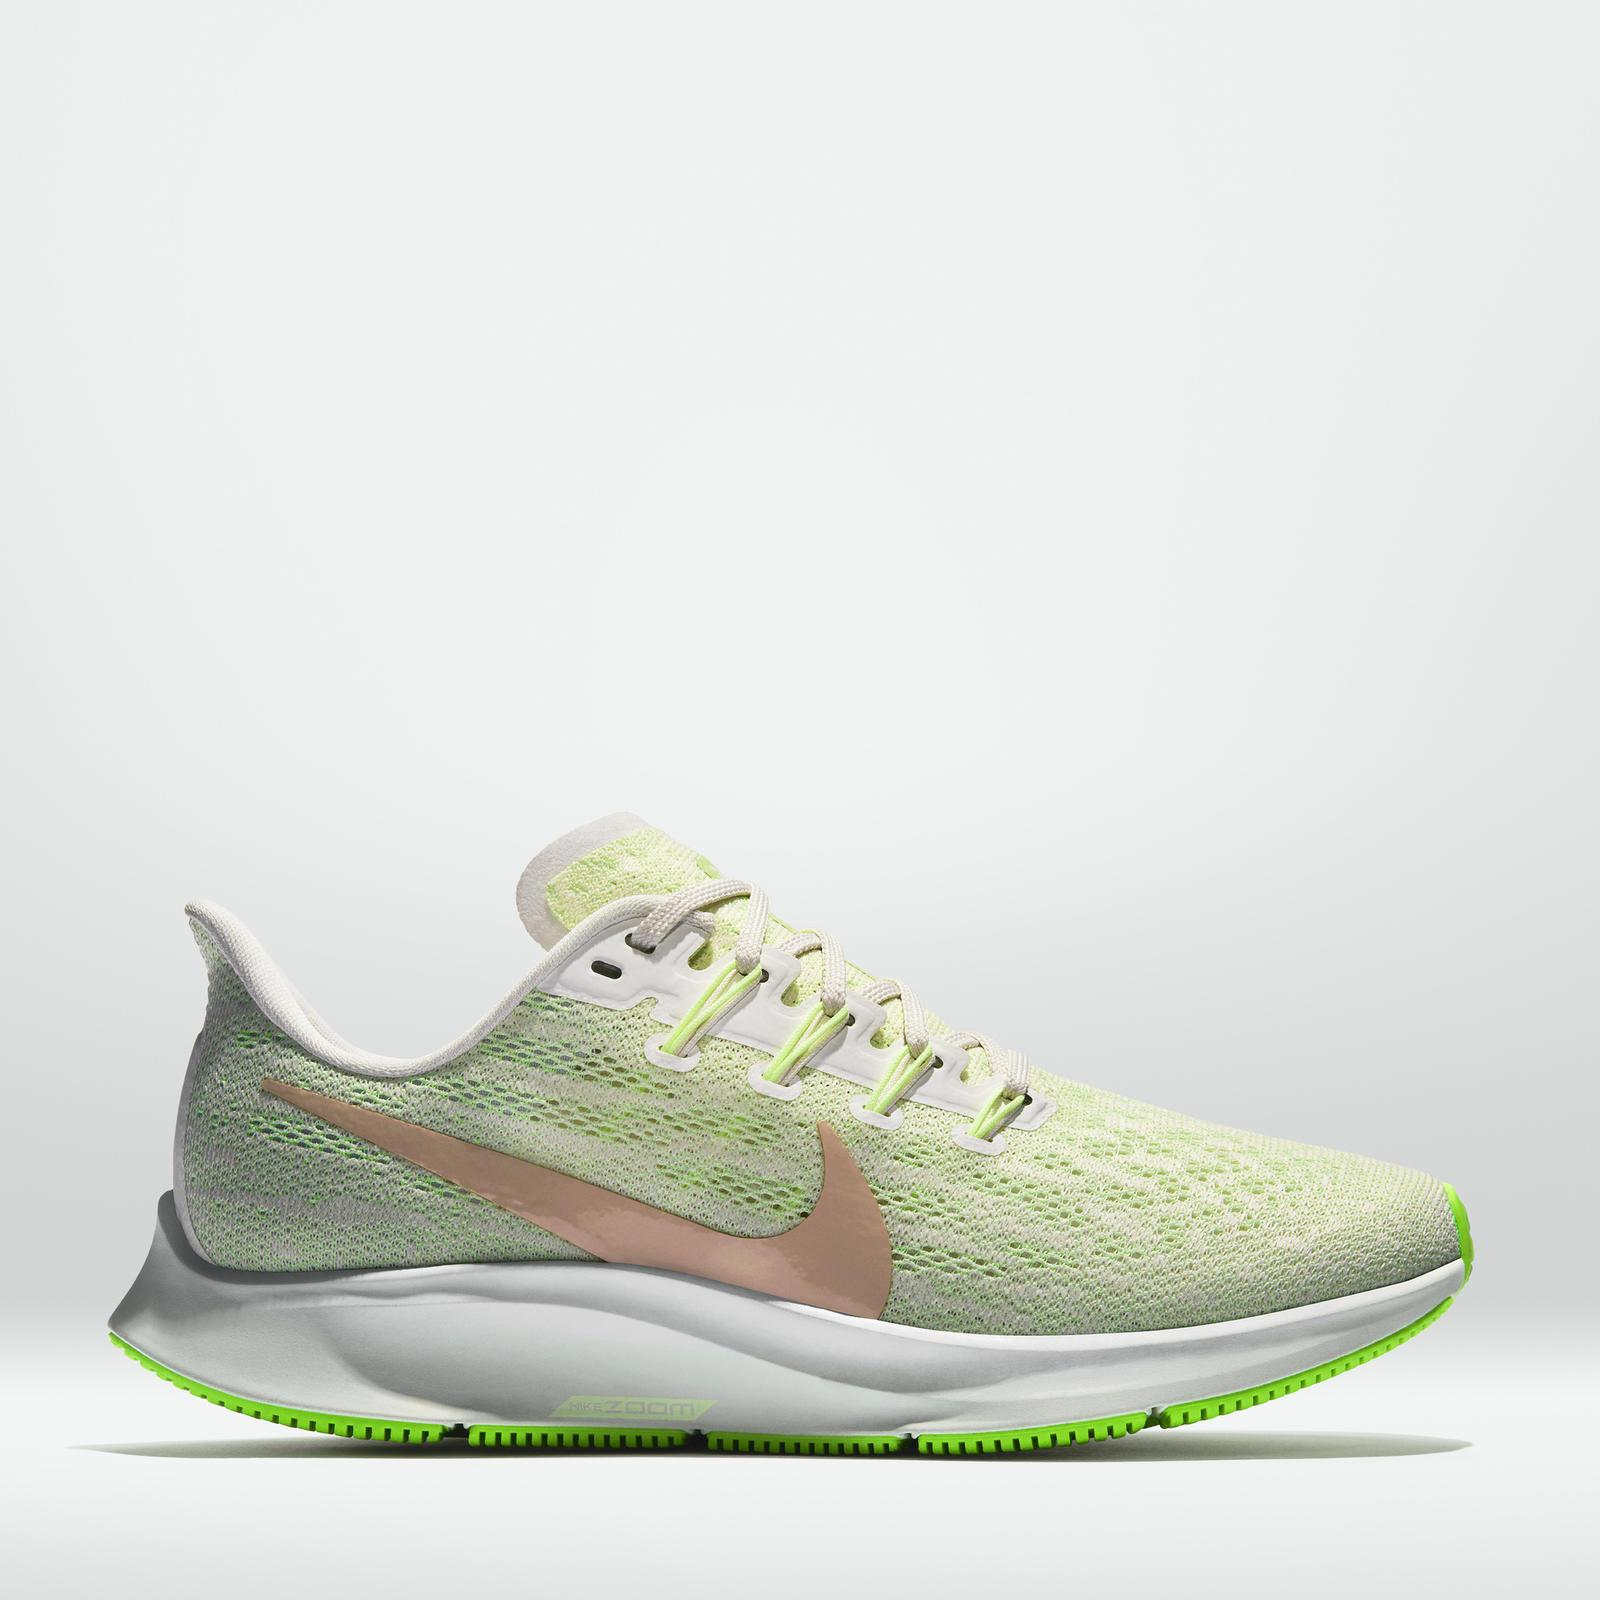 Nike Air Zoom Pegasus 36 Nike Zoom Pegasus Turbo 2 Nike ZoomX ...